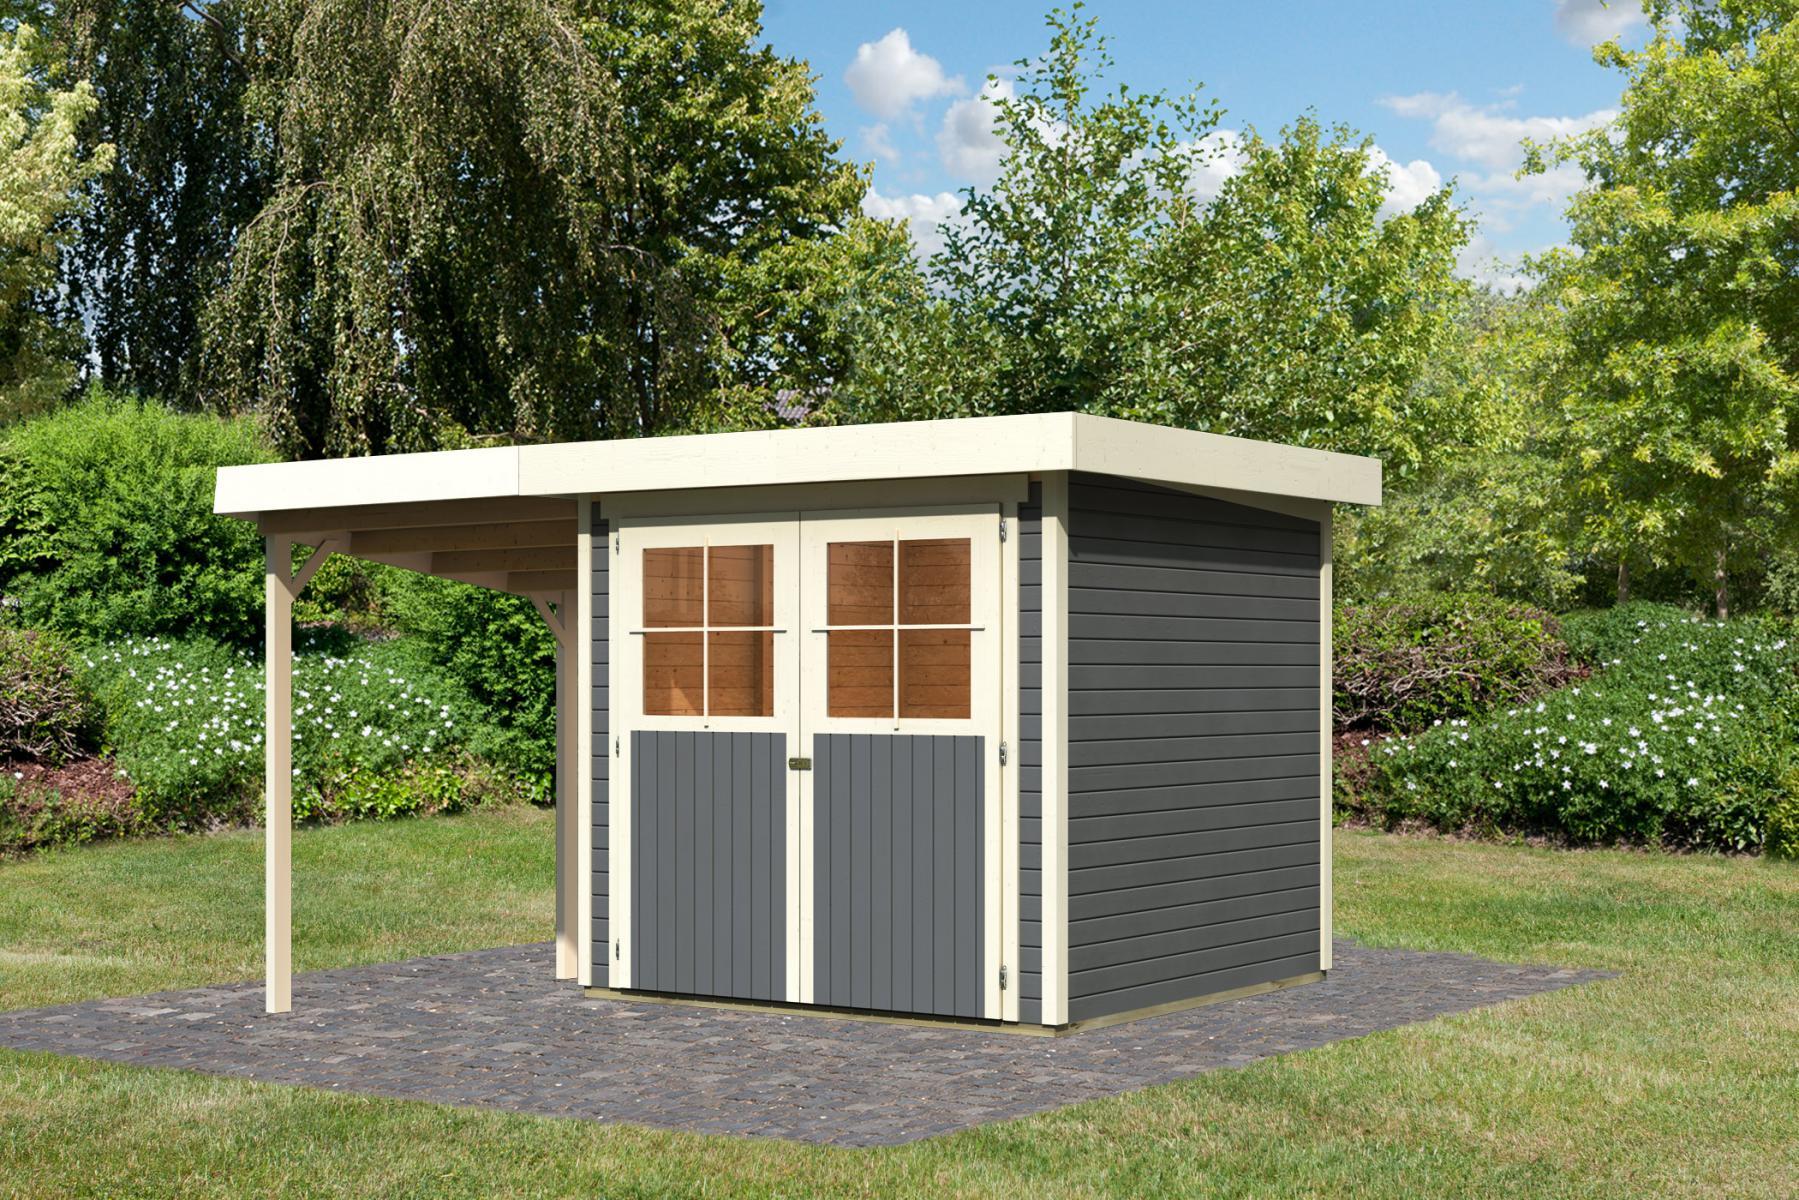 einzigartig gartenhaus metall pultdach schema garten design ideen. Black Bedroom Furniture Sets. Home Design Ideas